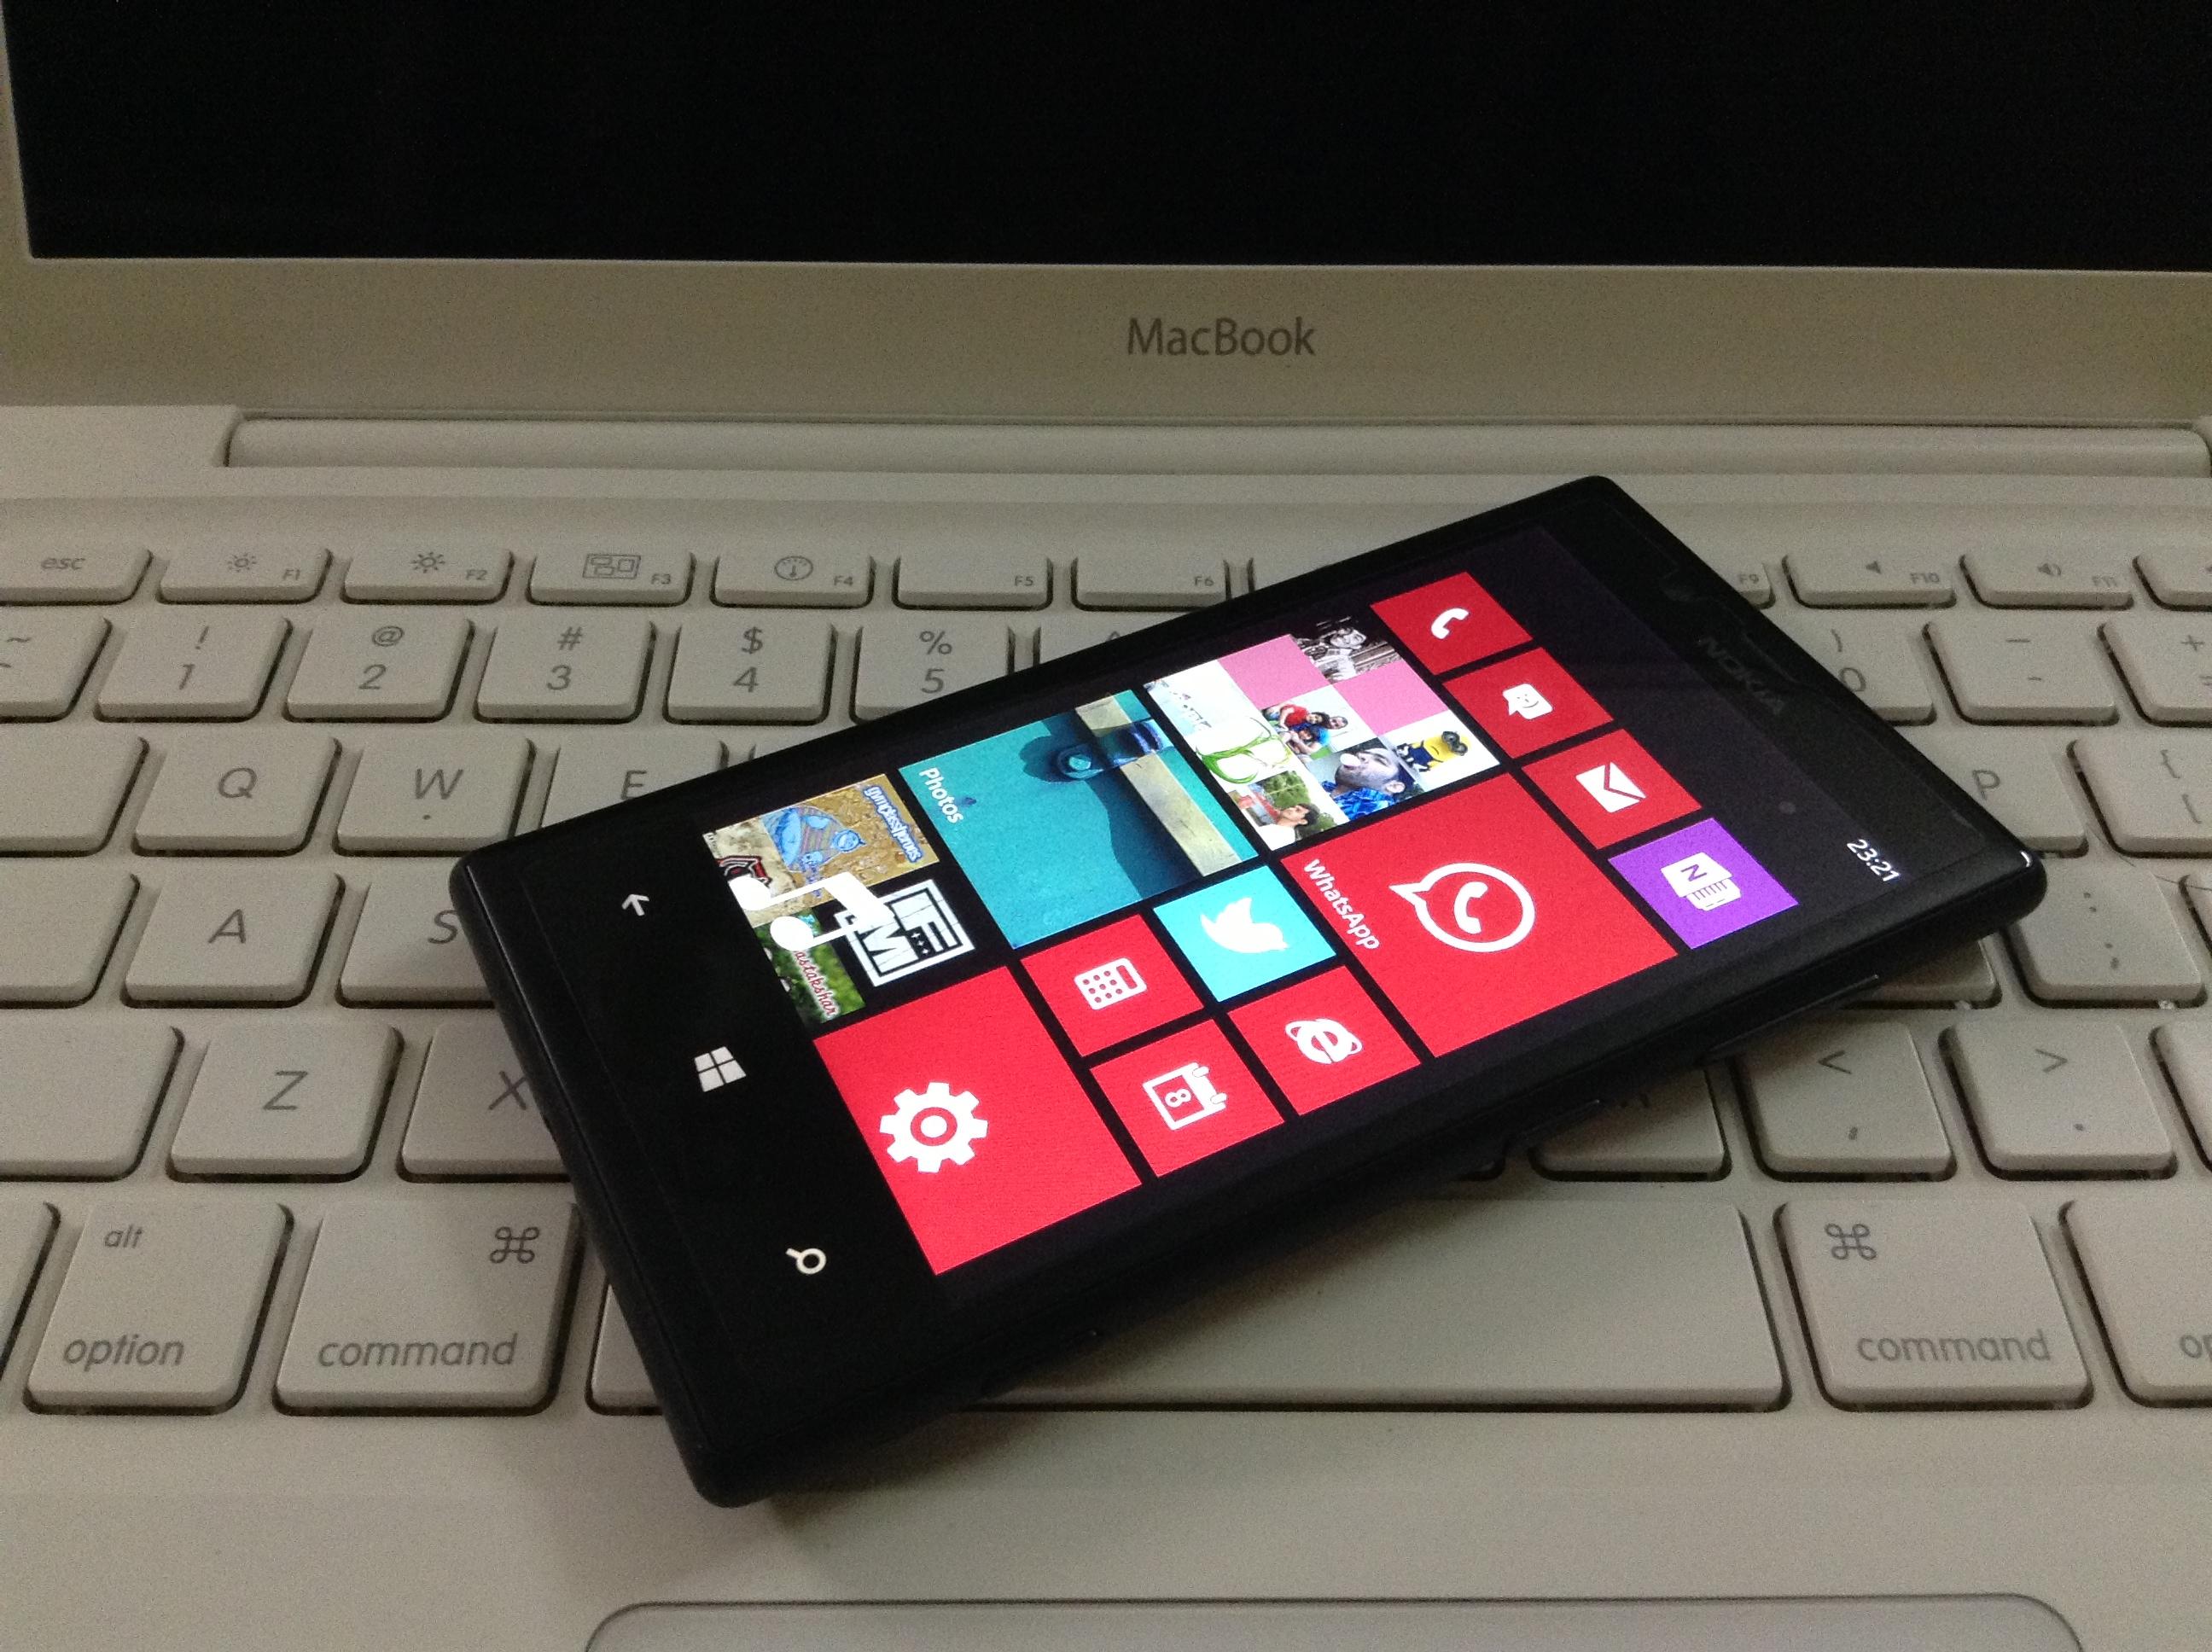 At the Finnish line : Nokia Lumia 720